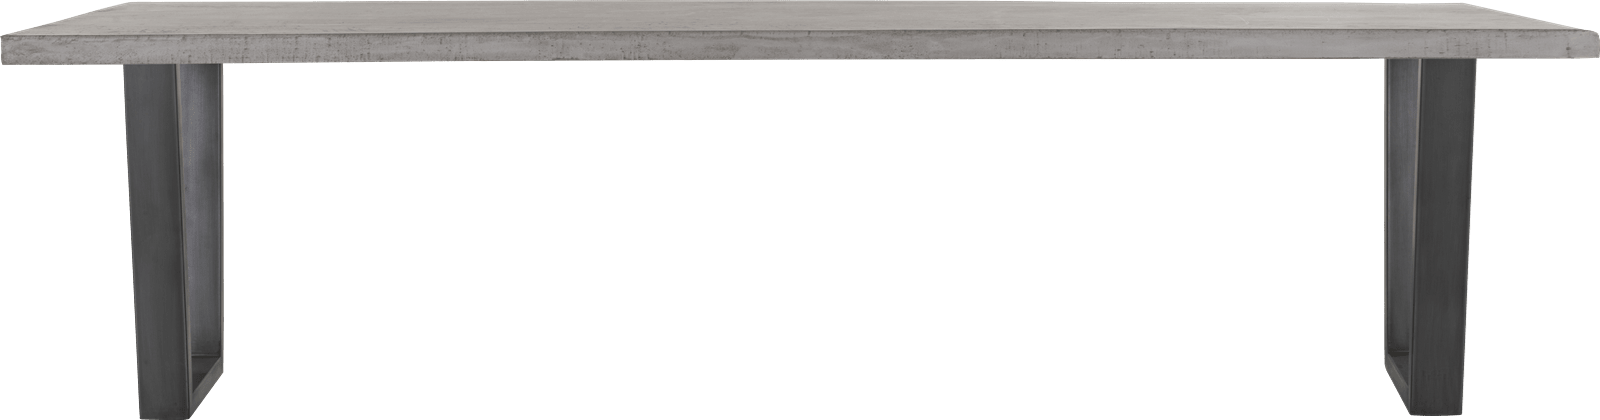 Farmero - tisch 240 x 100 cm